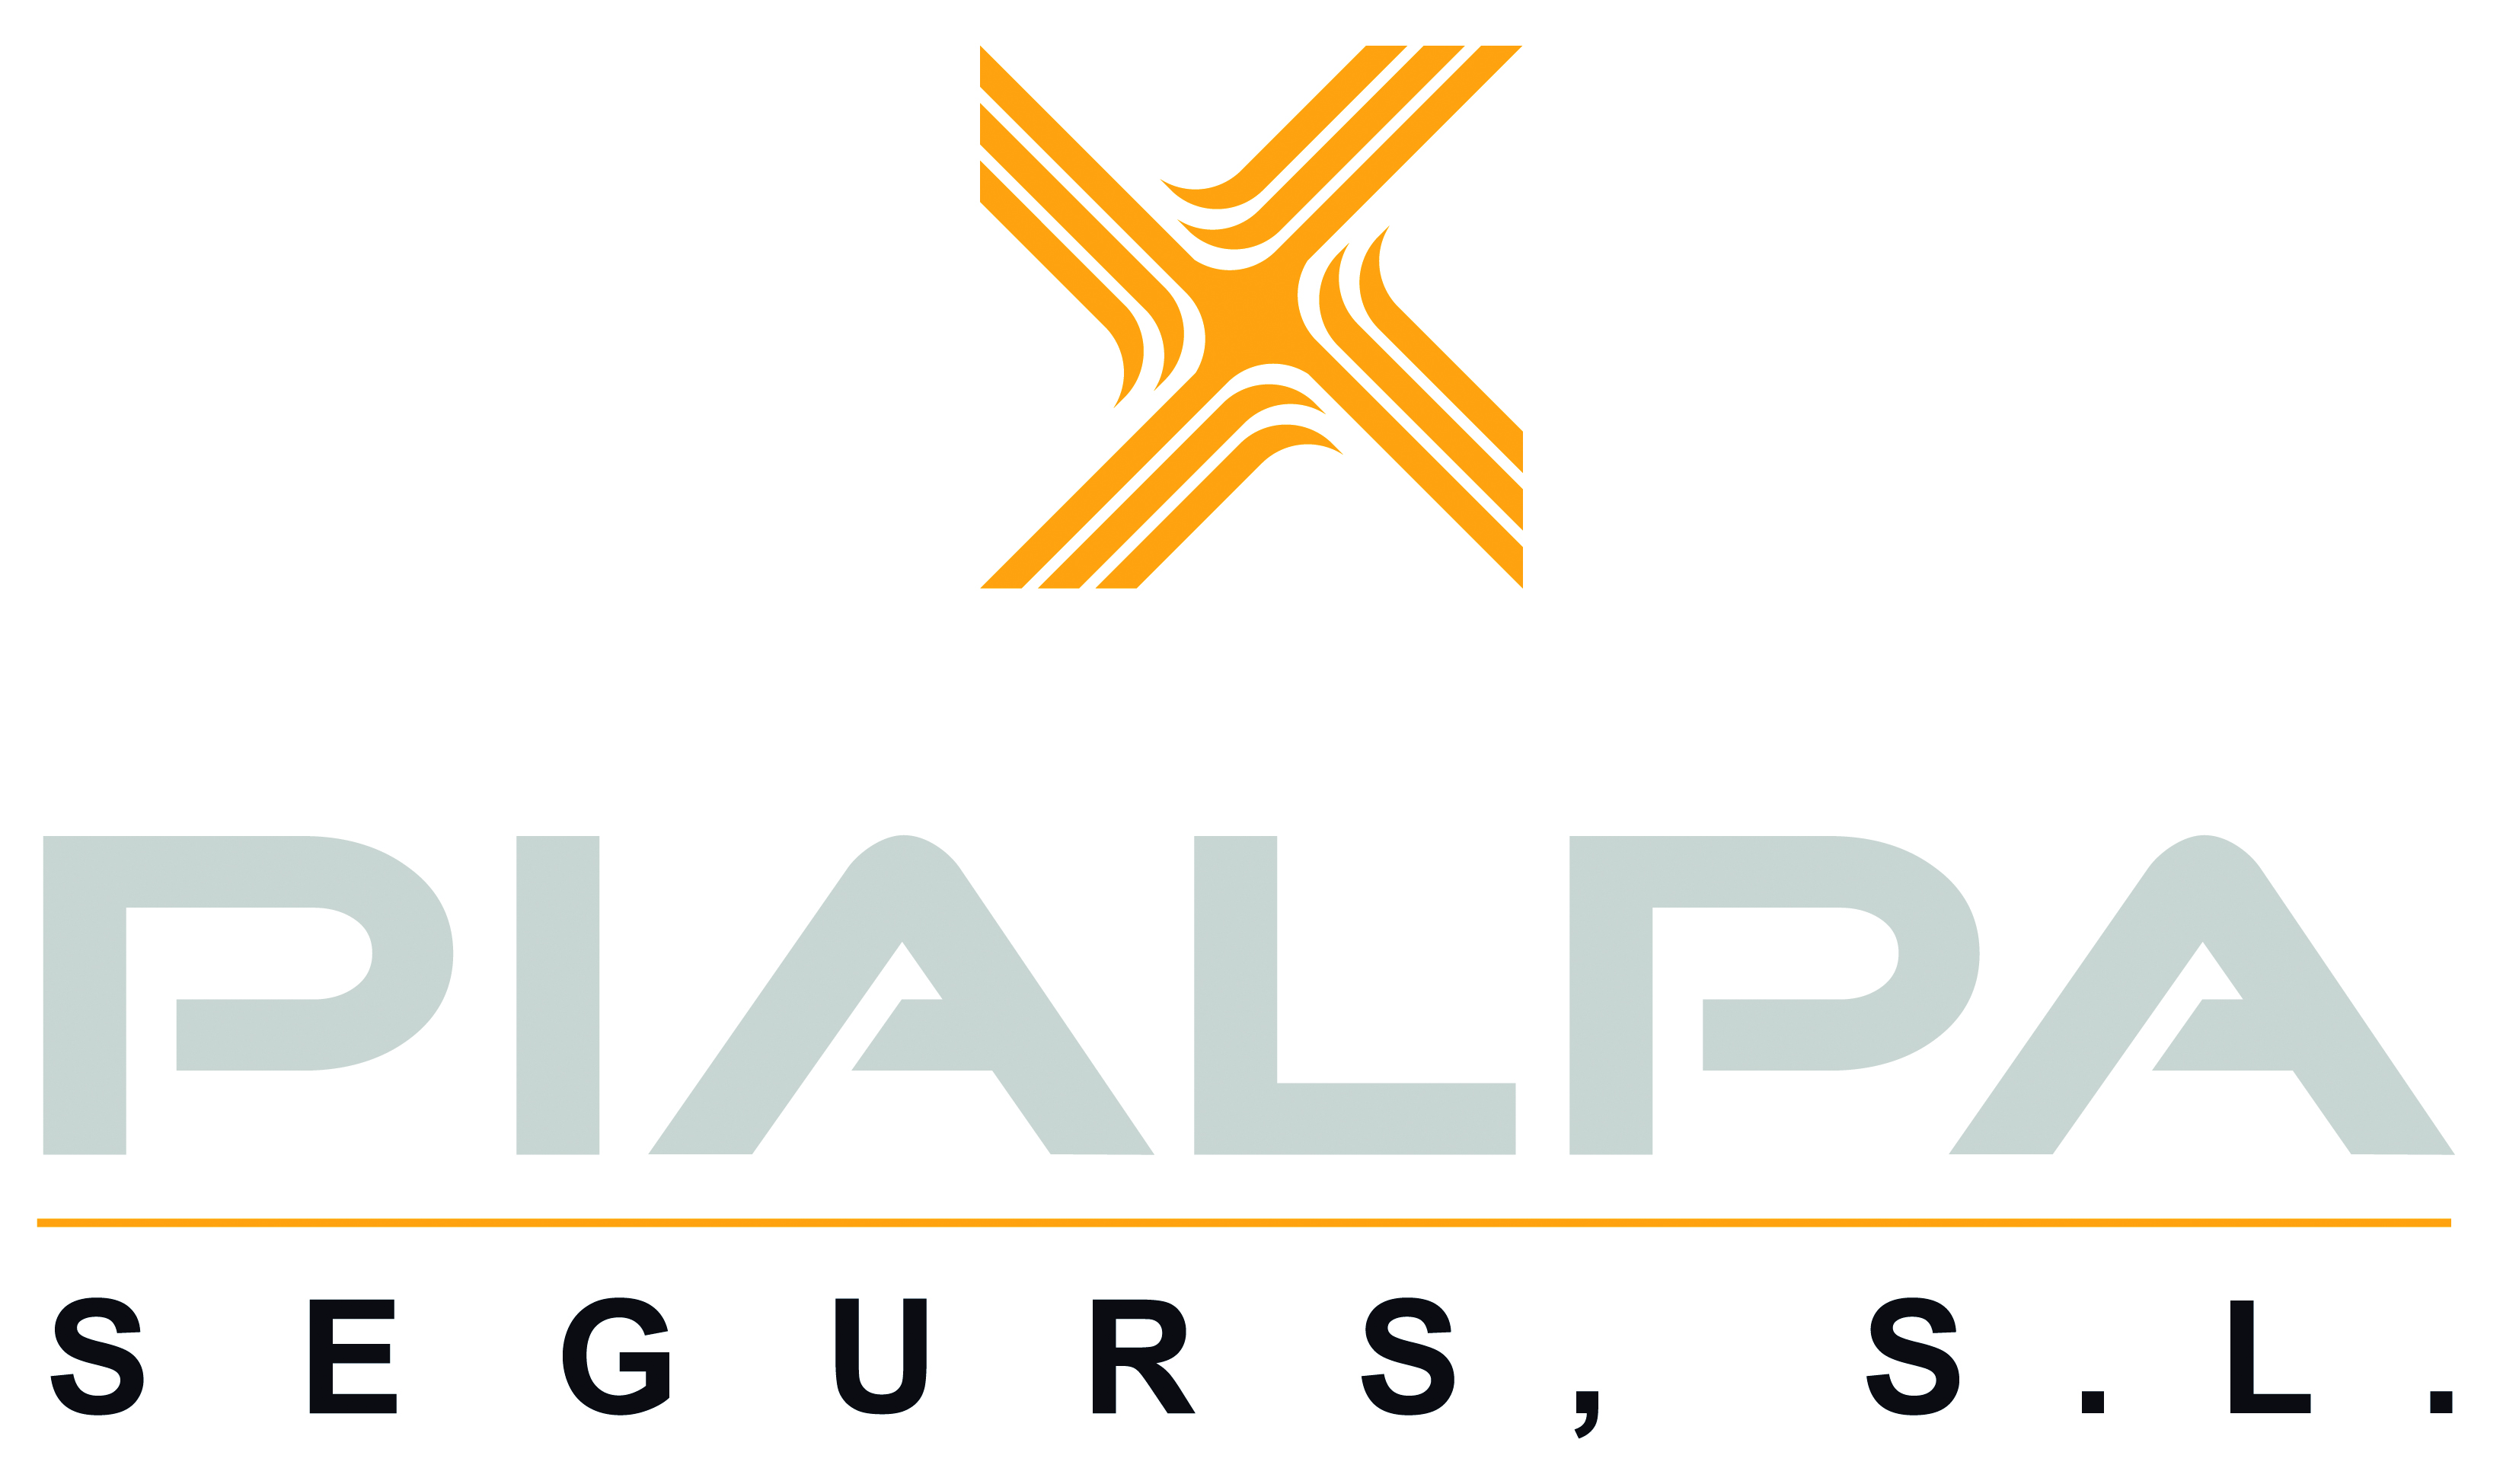 PIALPA - Segurs Pialpa